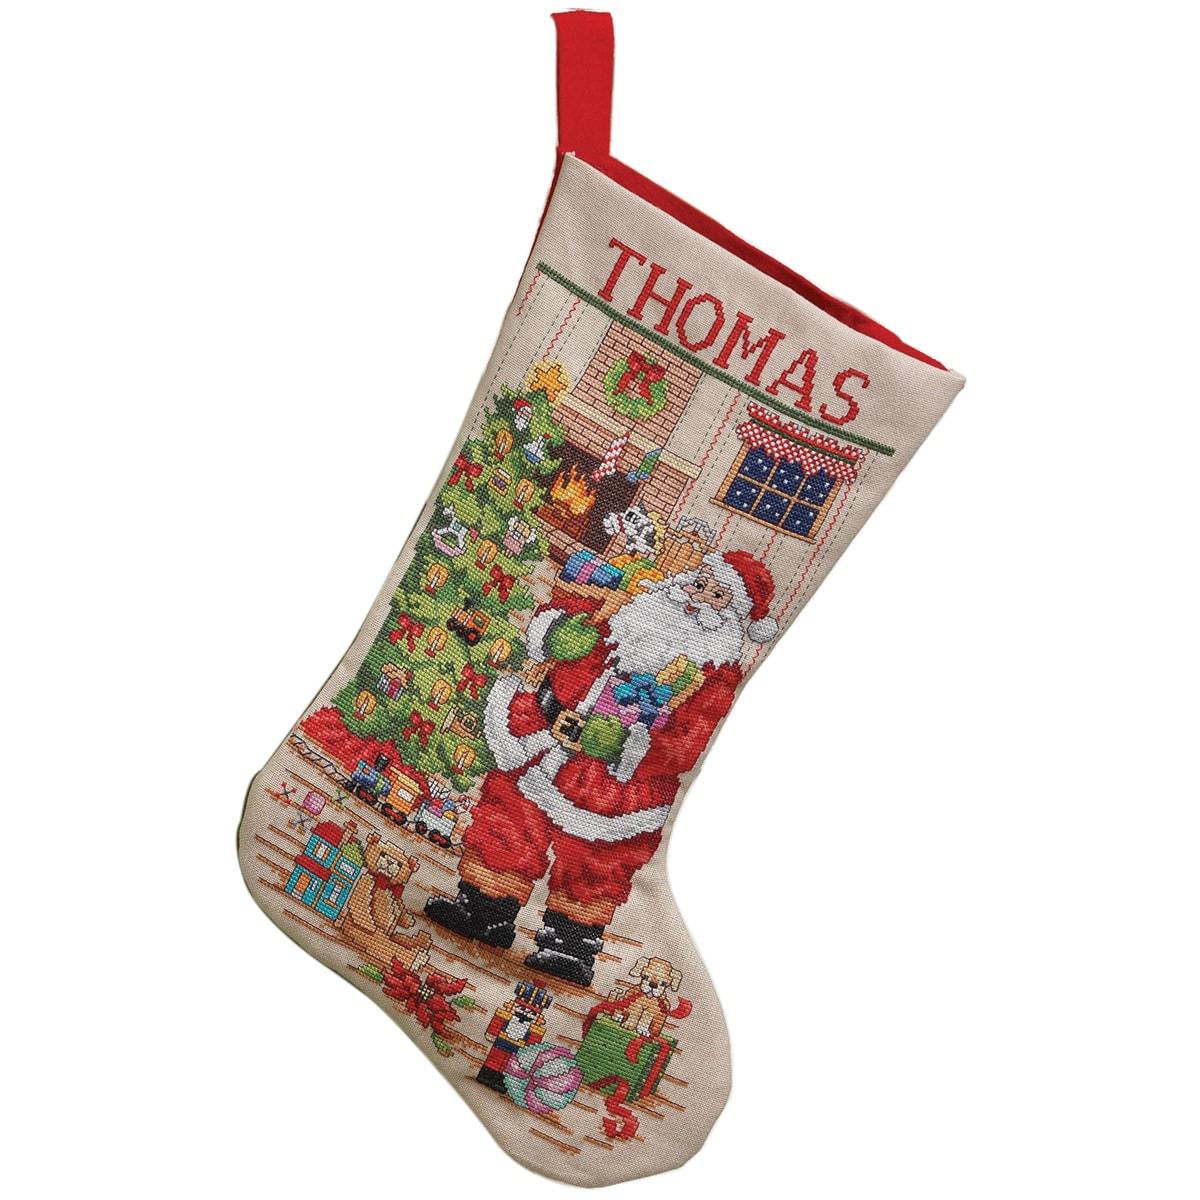 Stamped Cross Stitch Christmas Stocking Kits